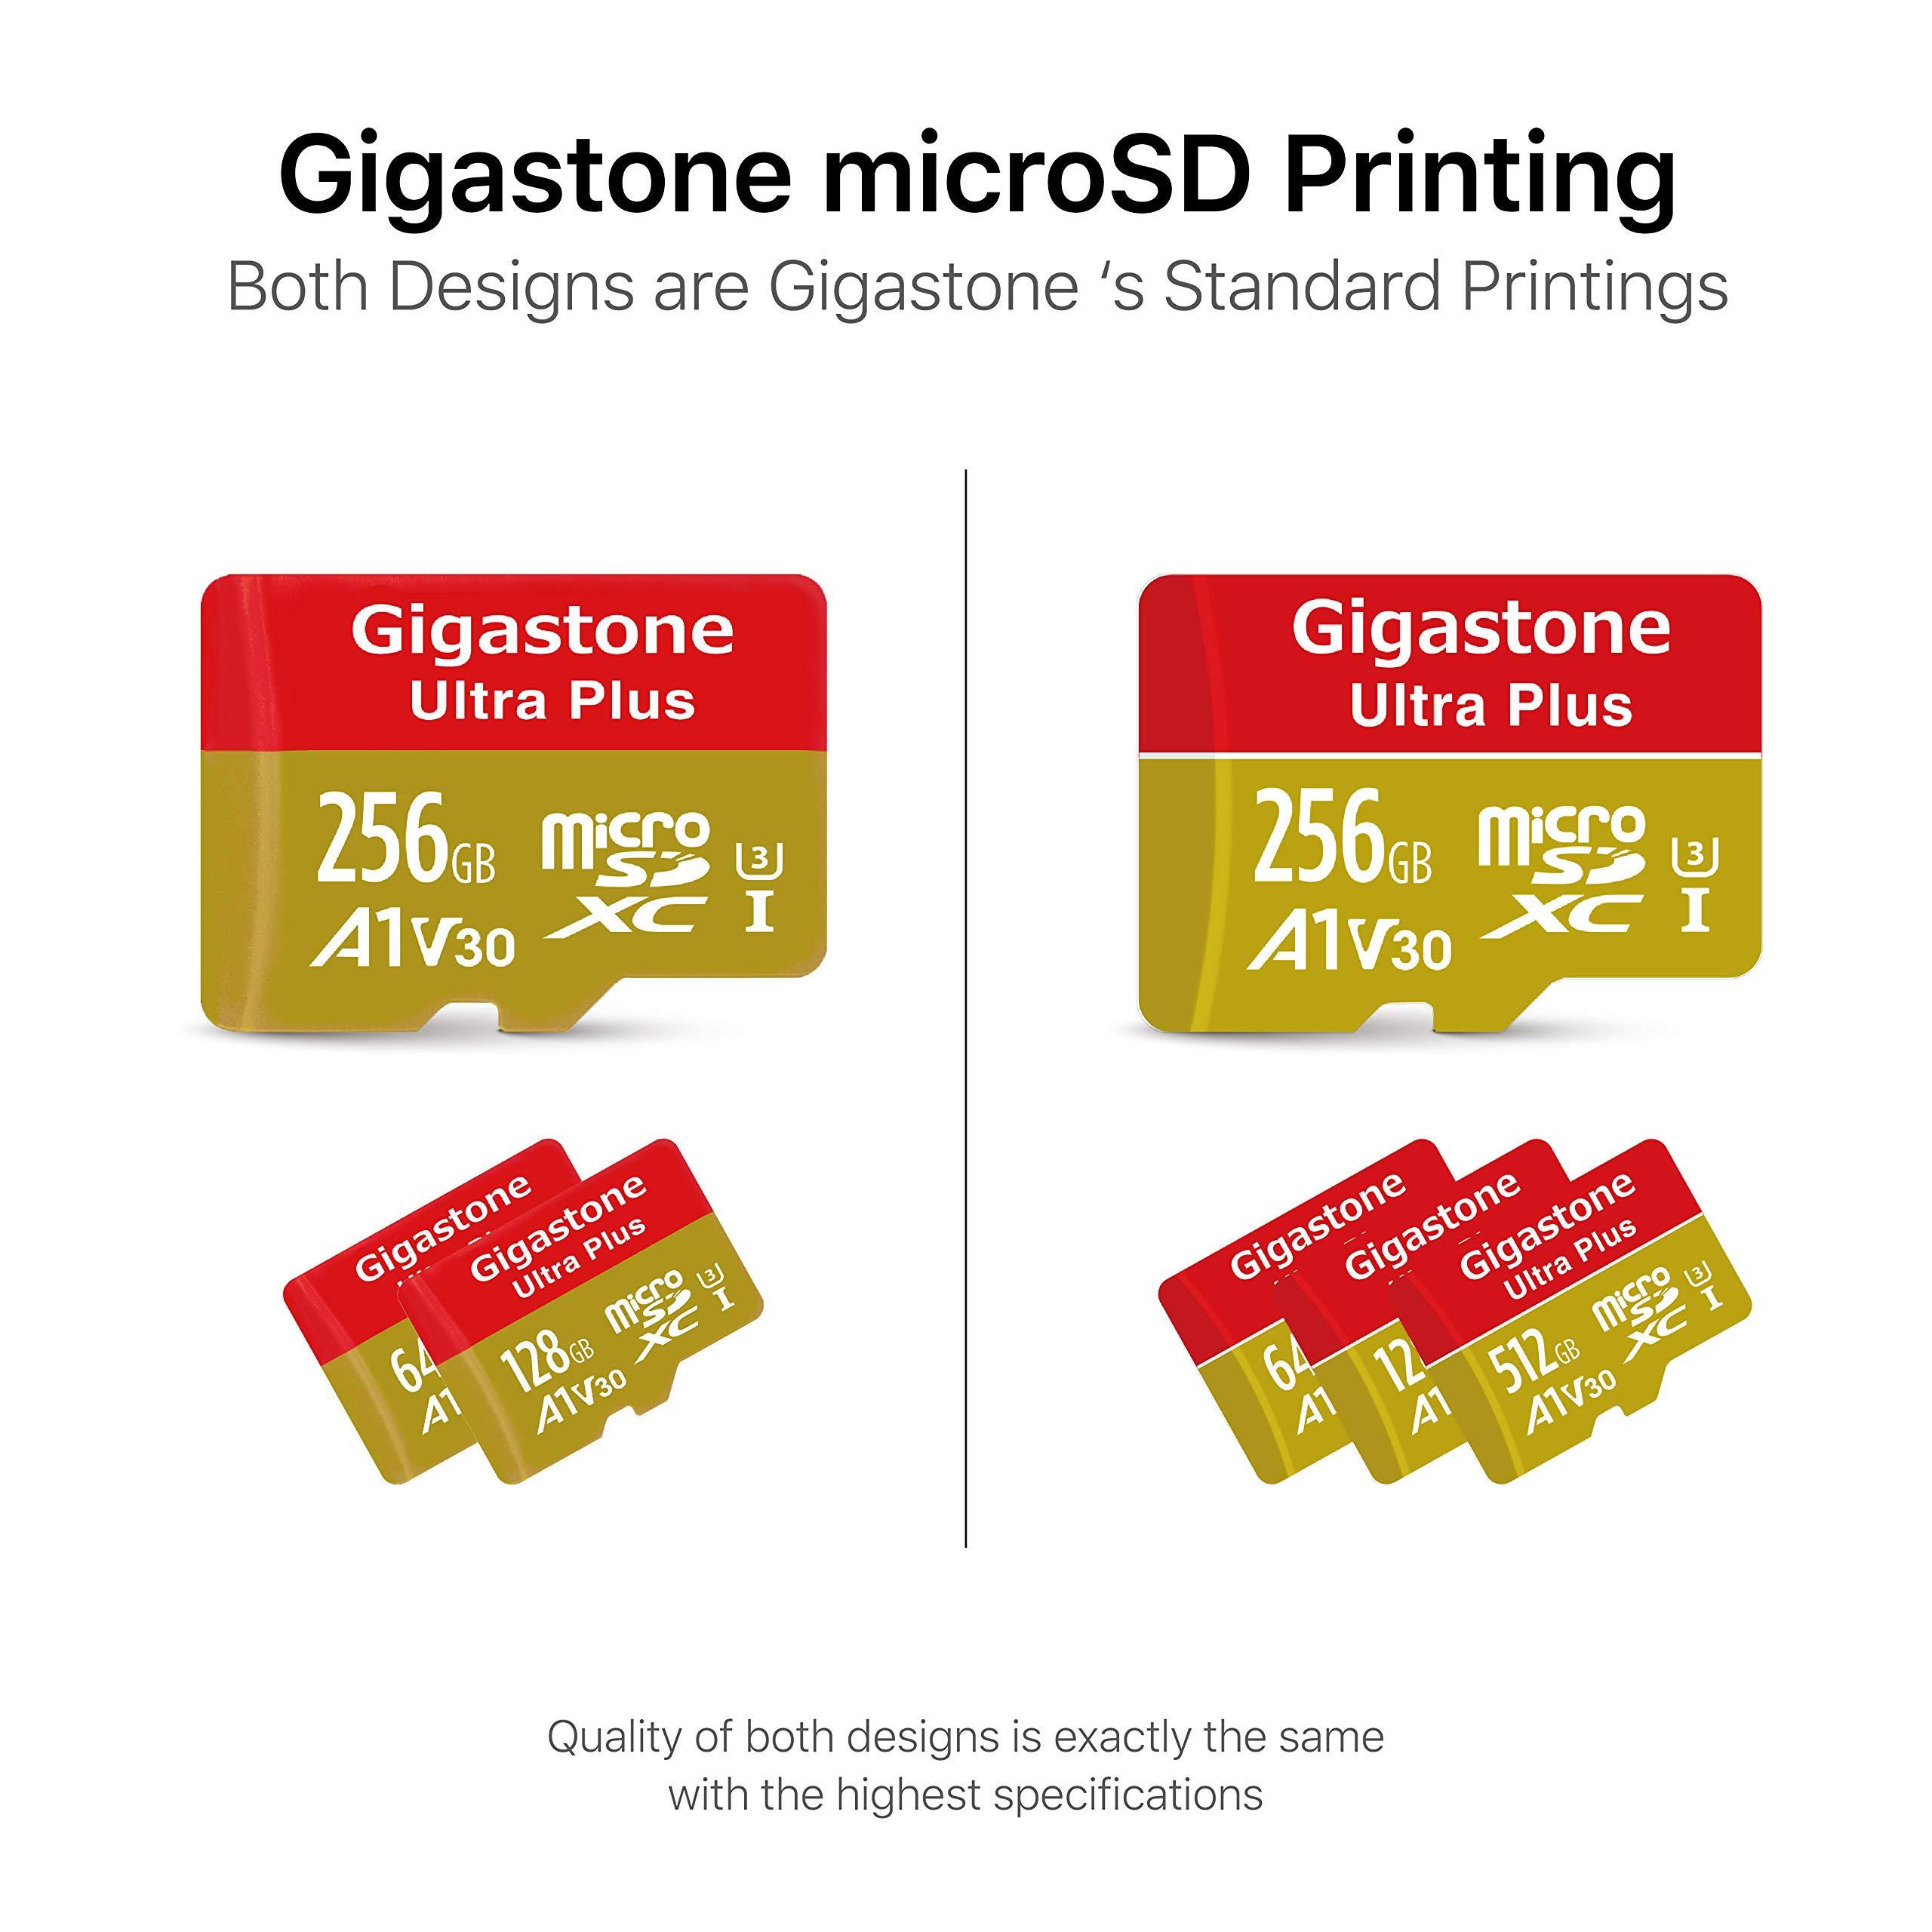 Gigastone 512GB Micro SD Card A1 V30 U3 C10 Class 10 Micro SDXC UHS-I Memory Card with MicroSD to SD Adapter High Speed 4K Ultra HD Video Camera Canon Dashcam DJI Drone Gopro Nikon Nintendo Samsung